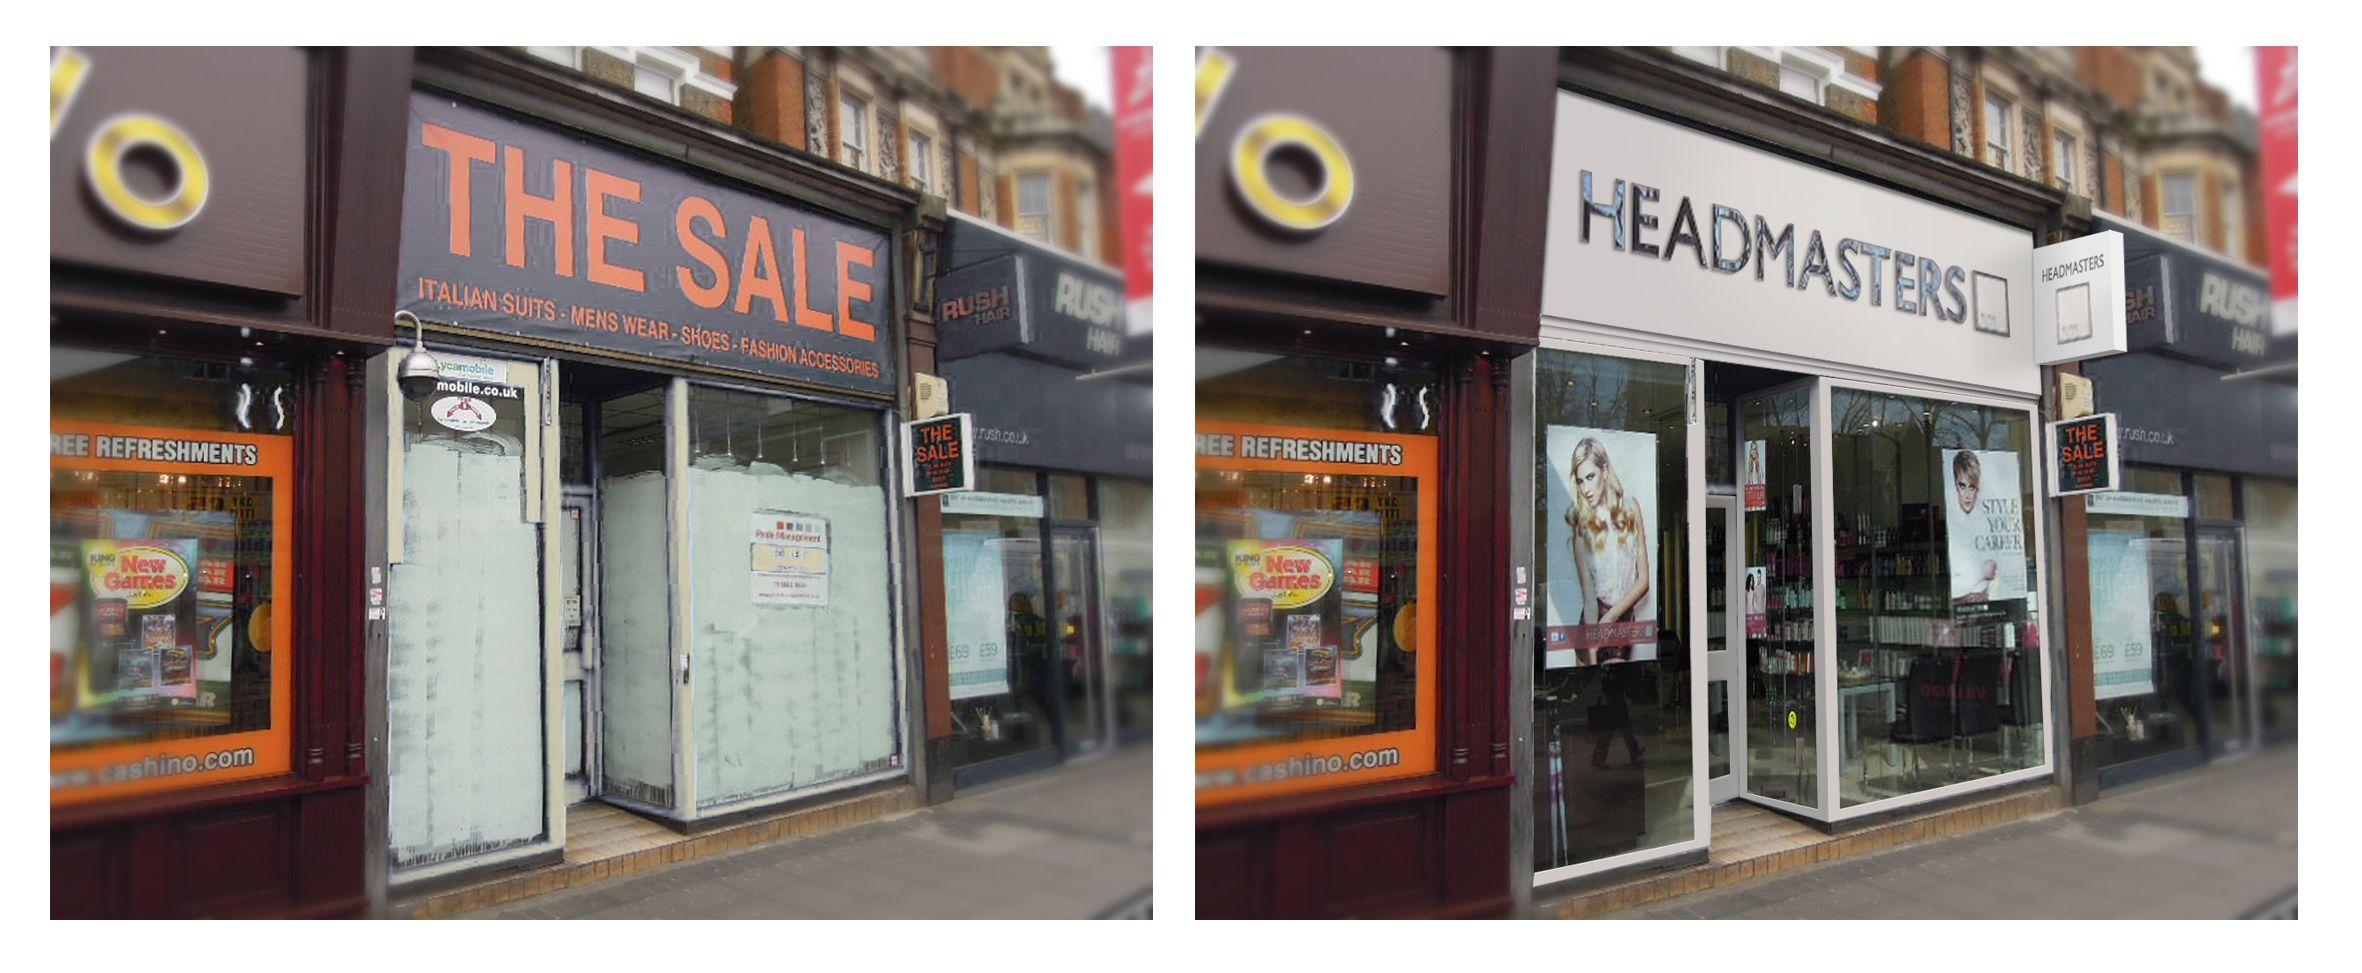 Digital store front mockup for Headmasters hair salon